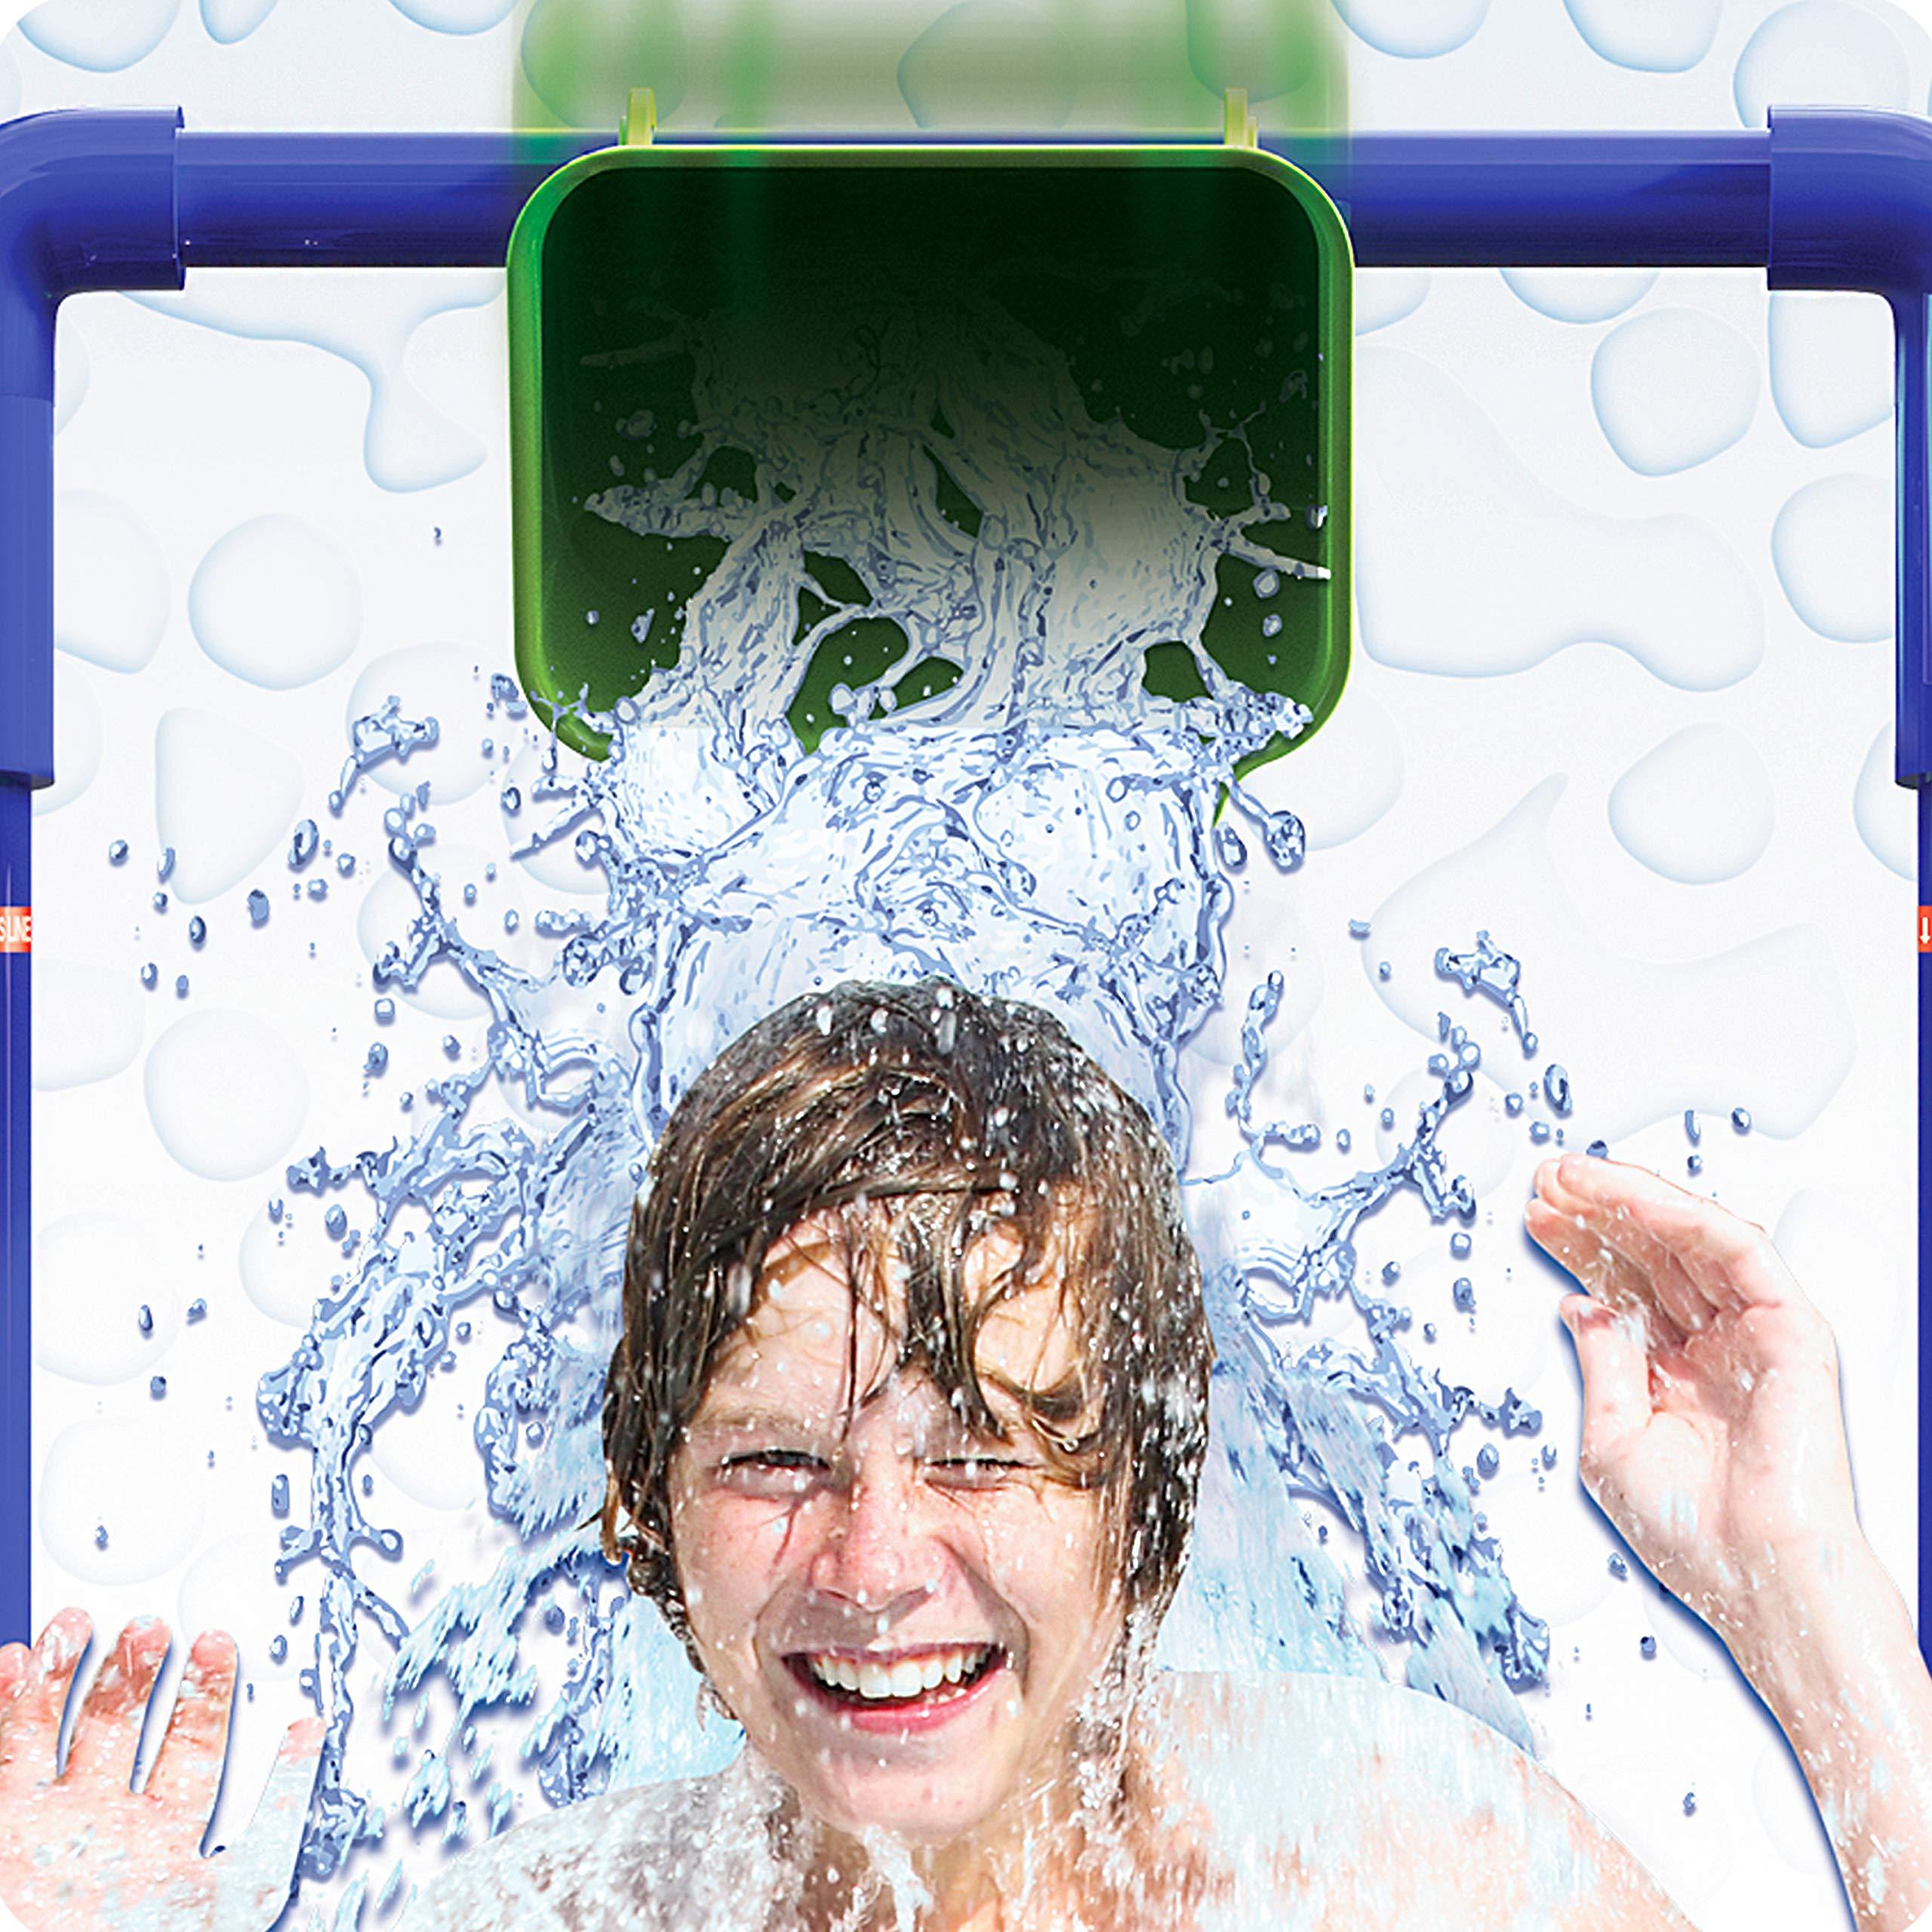 Kaos Water Play KAOS Splash Tank (Alternative Dunk Tank), Multicolor by Kaos Water Play (Image #3)